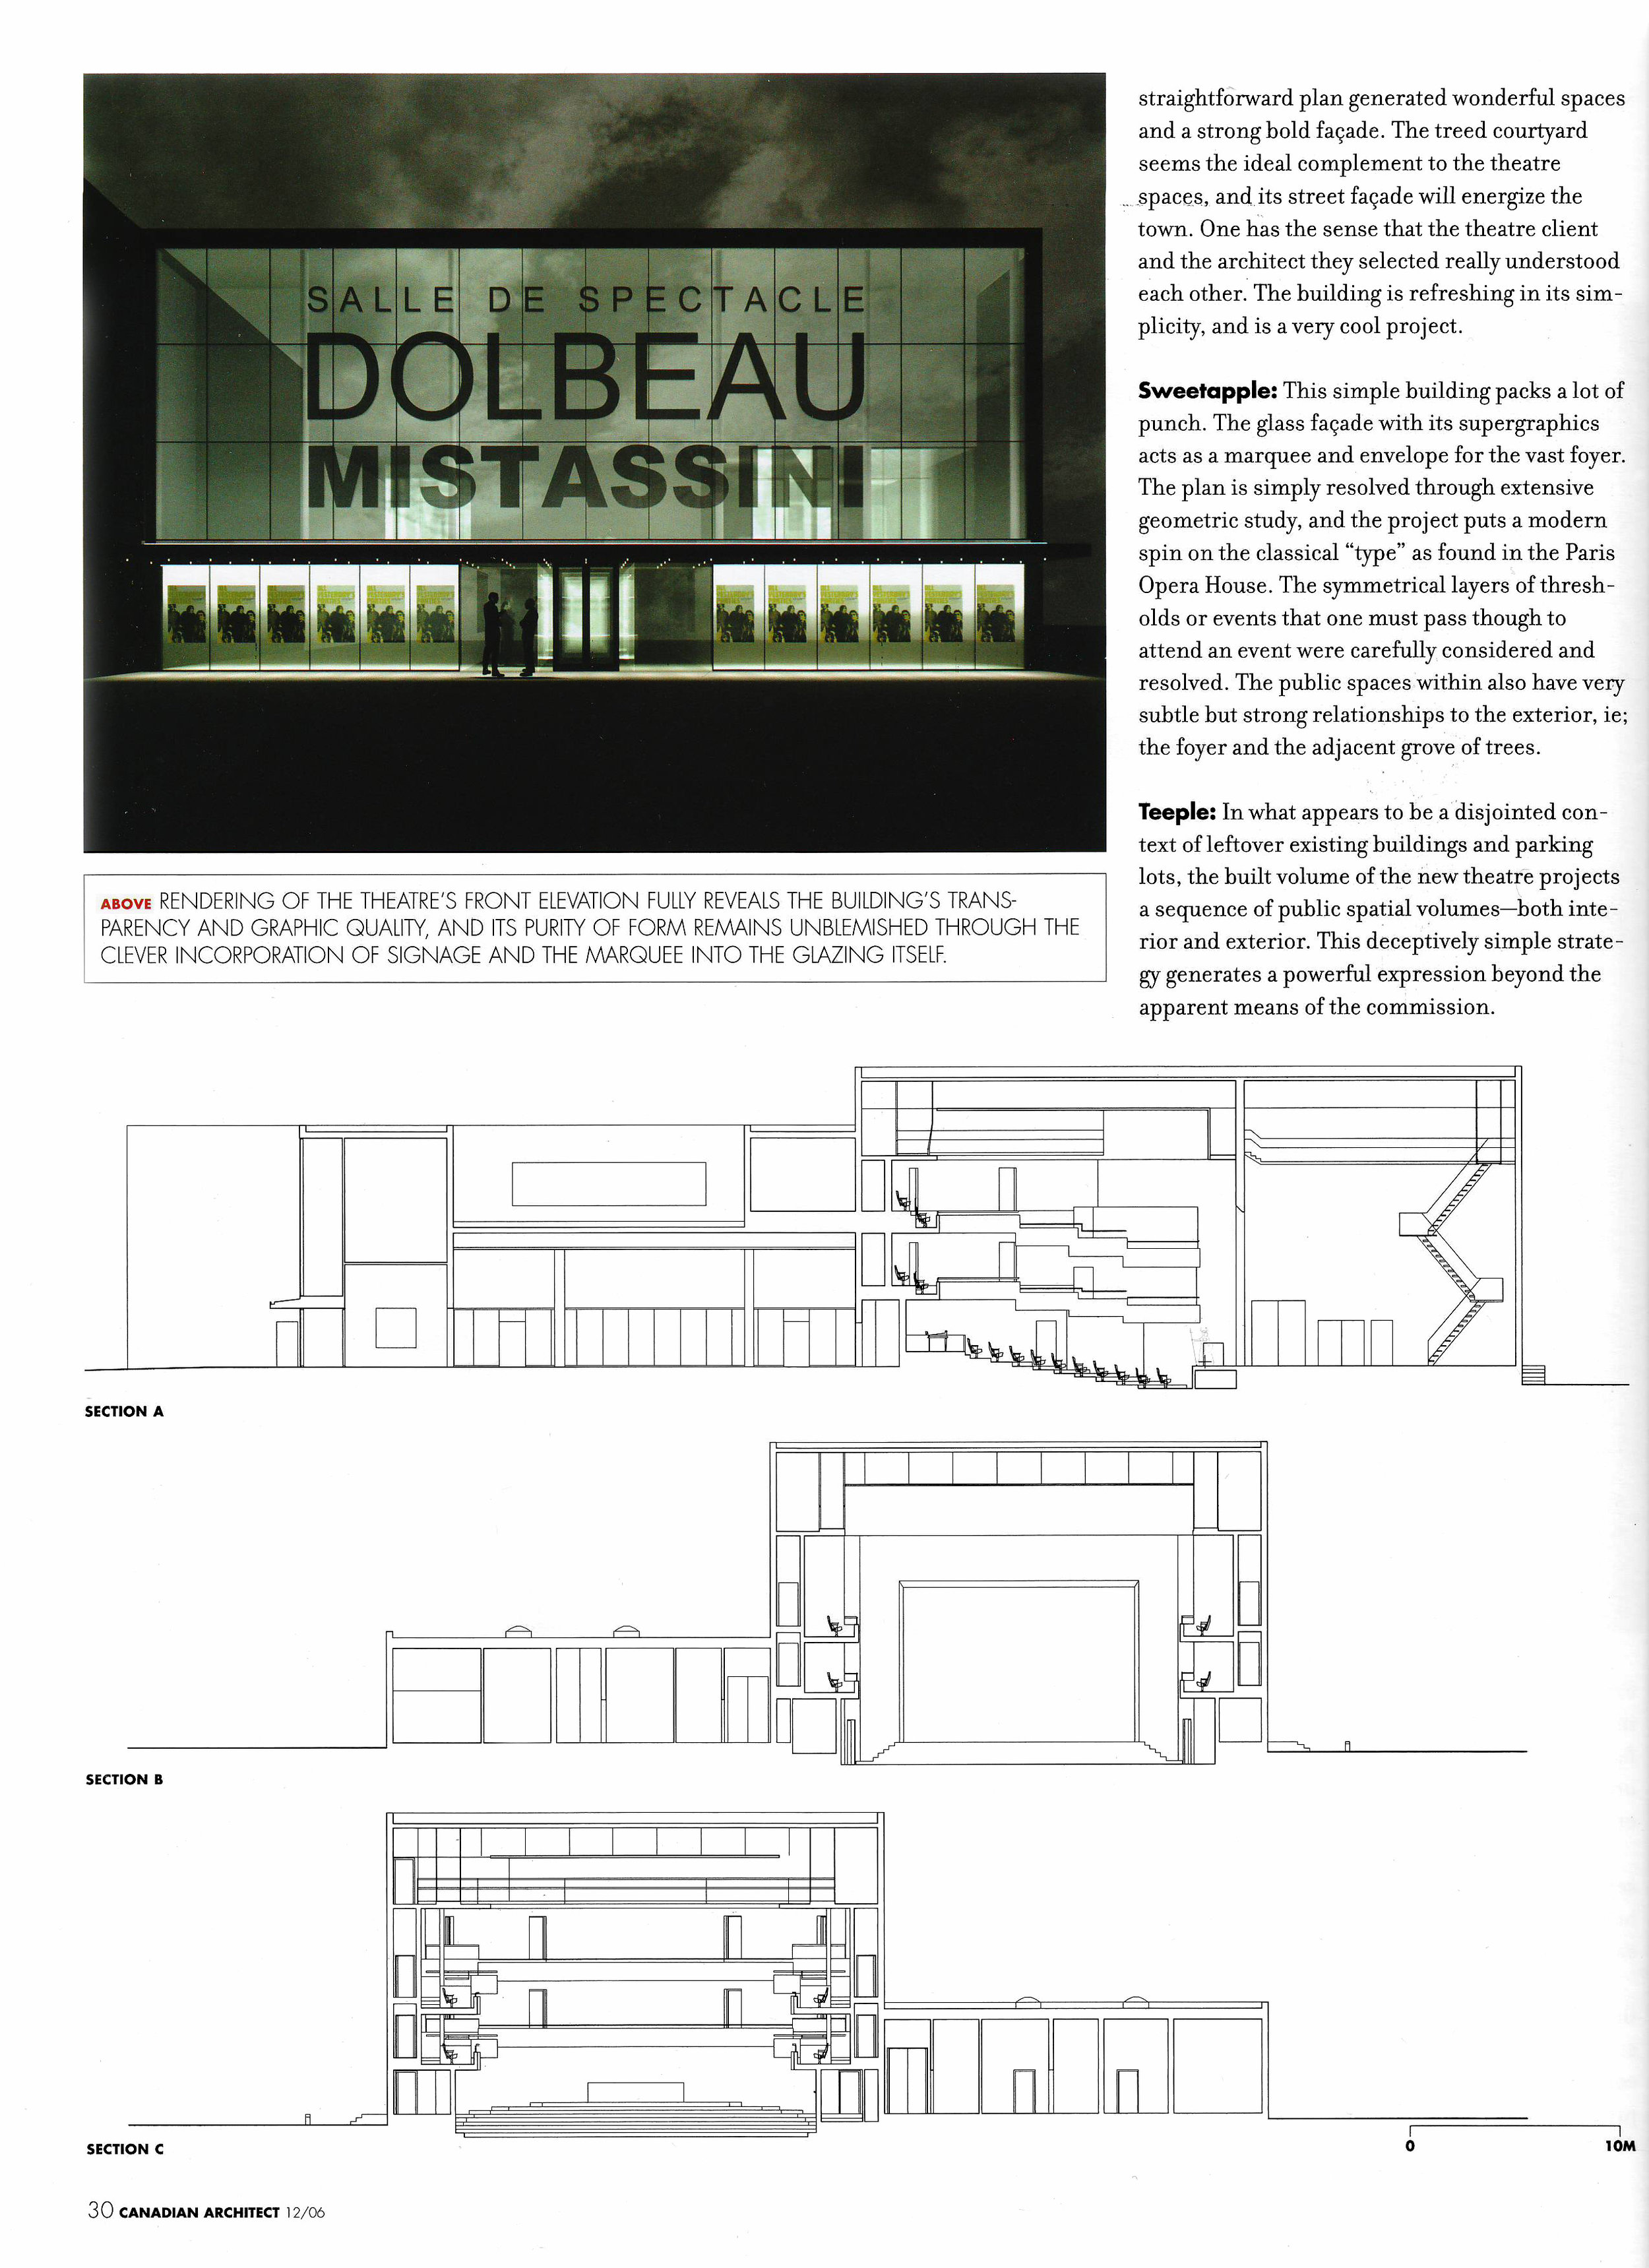 Copy of Award of Excellence: Salle De Spectacle Desjardins